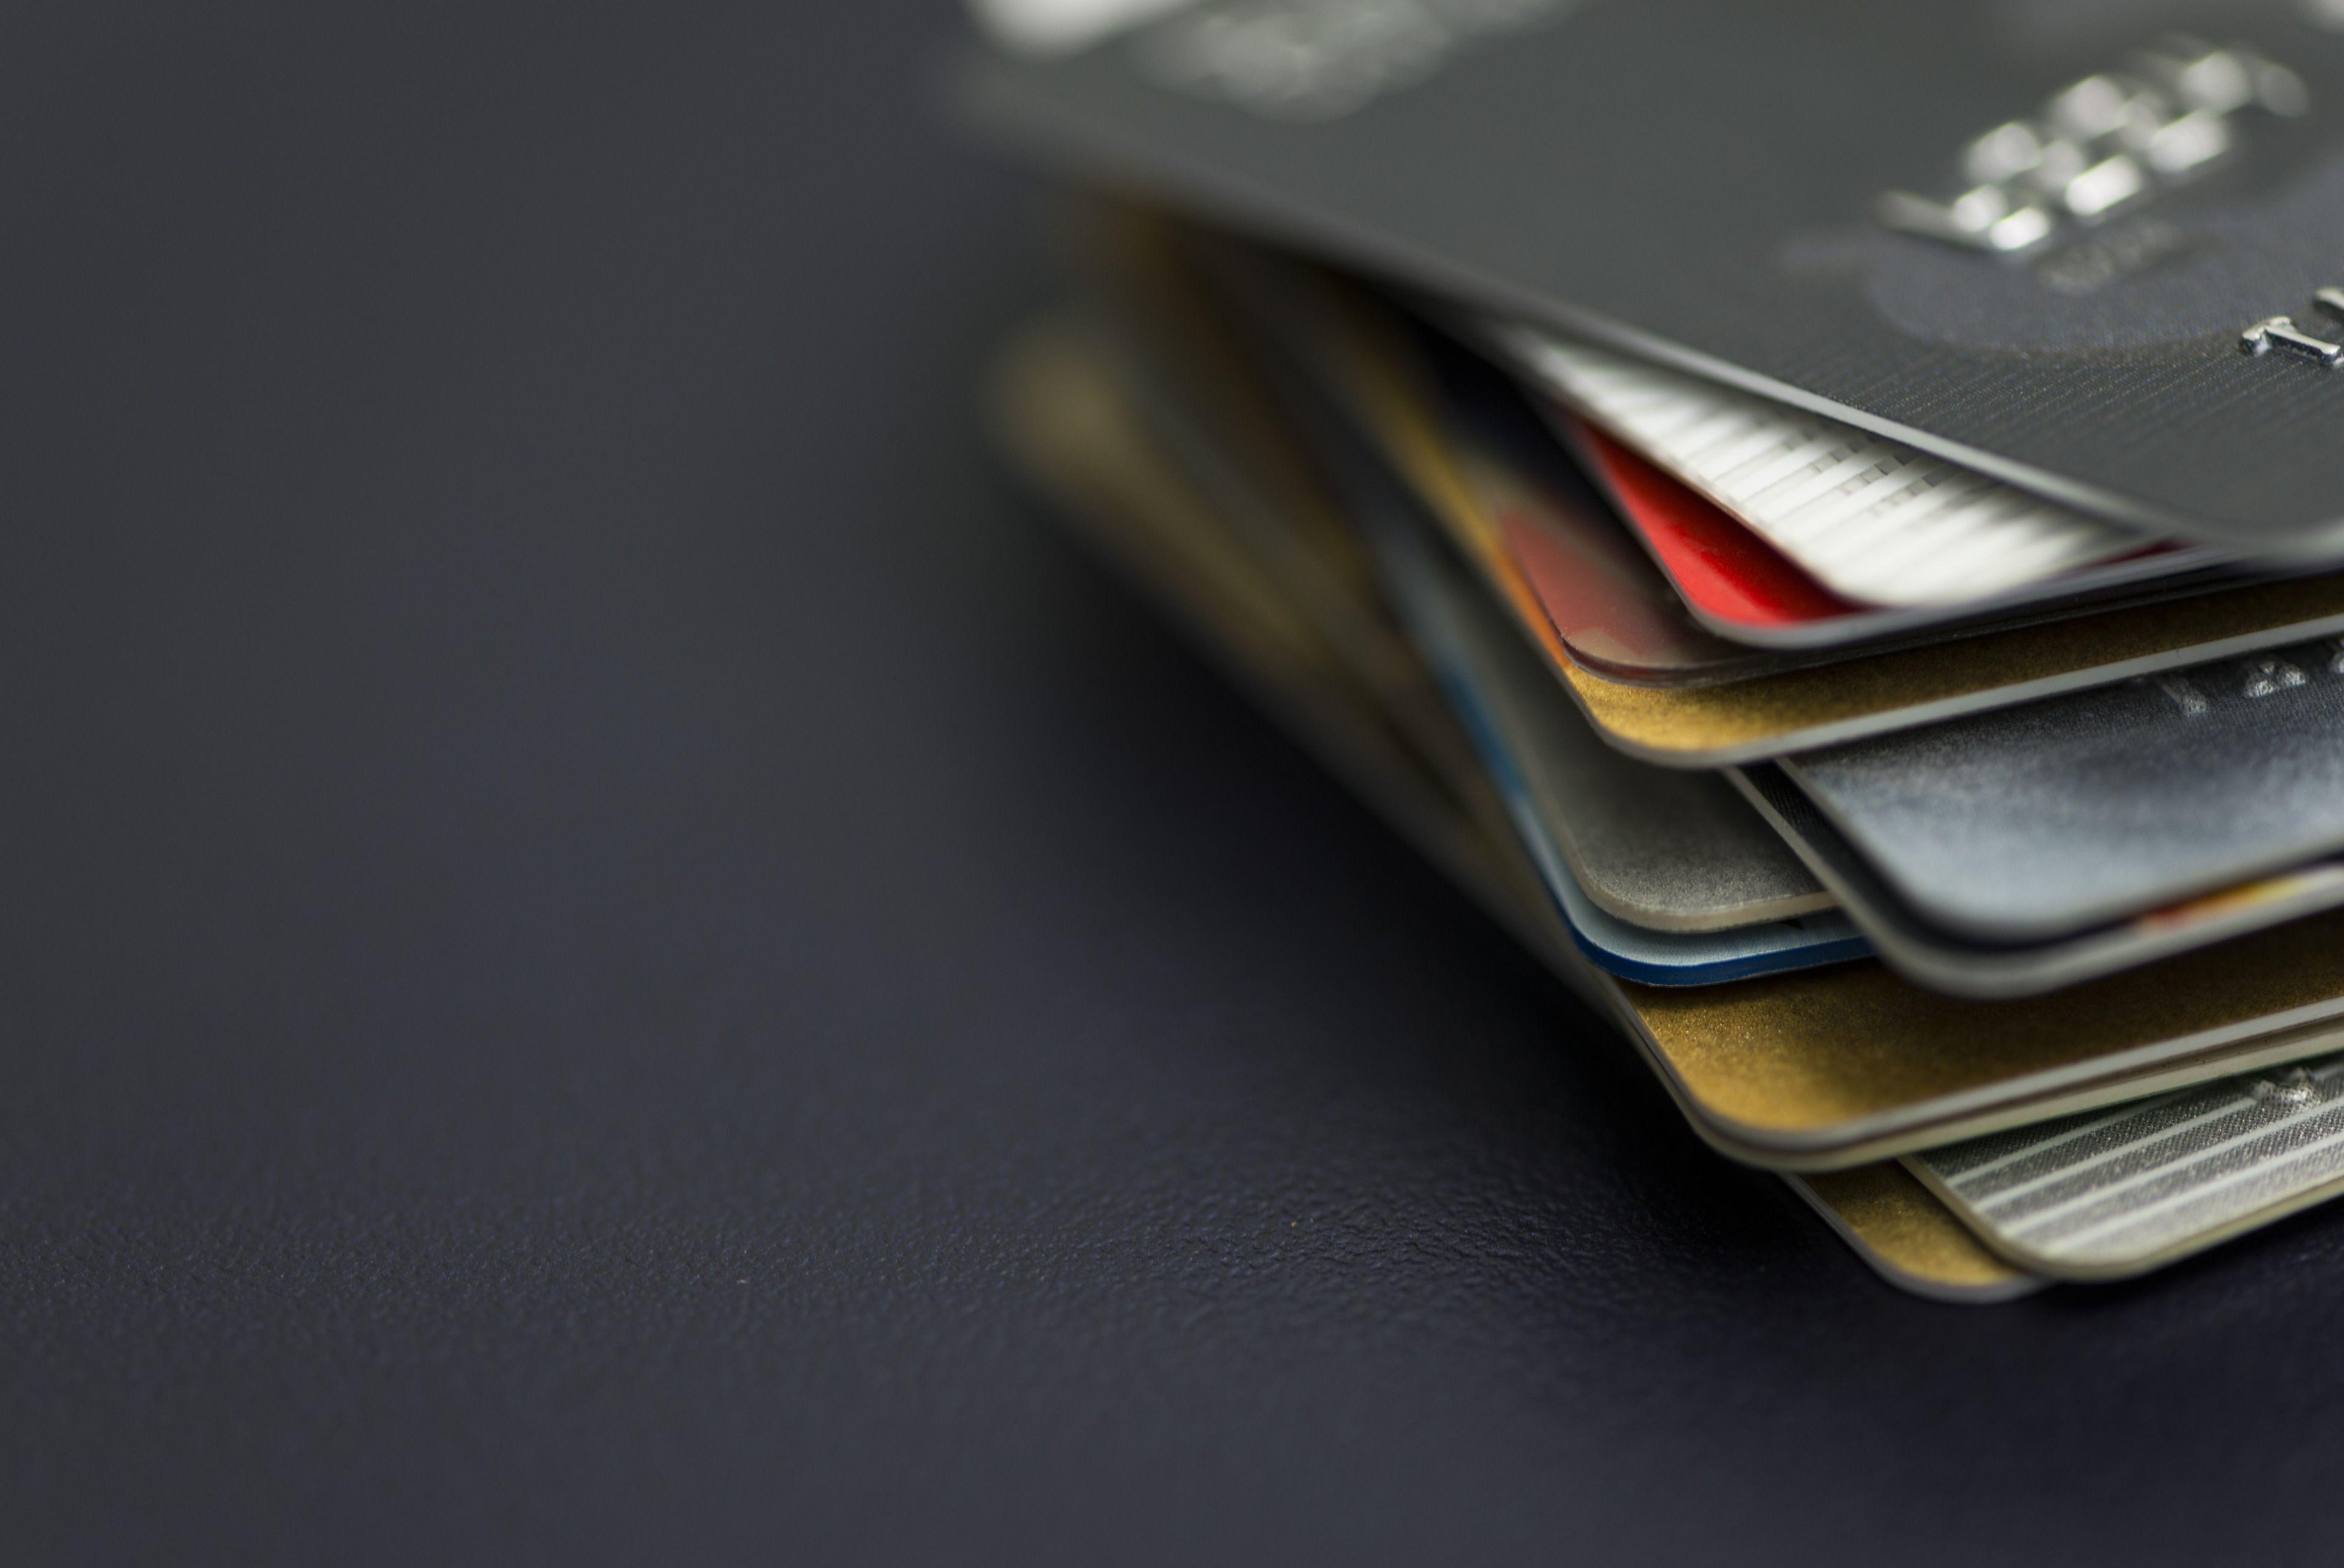 Credit repair companies the target of classaction lawsuit